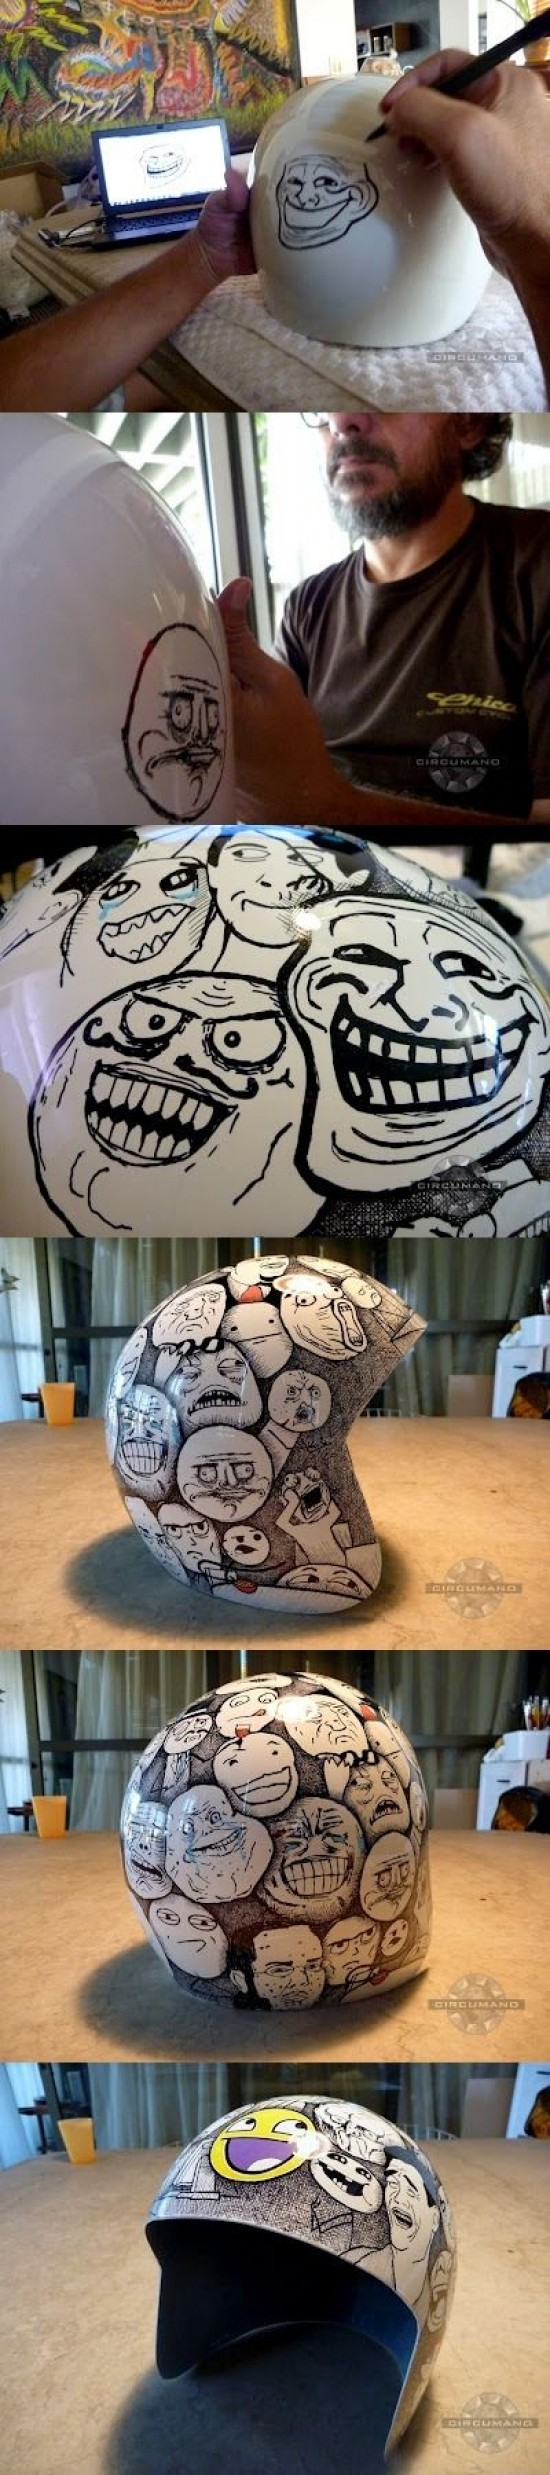 arte,casco,memes,moto,pintar